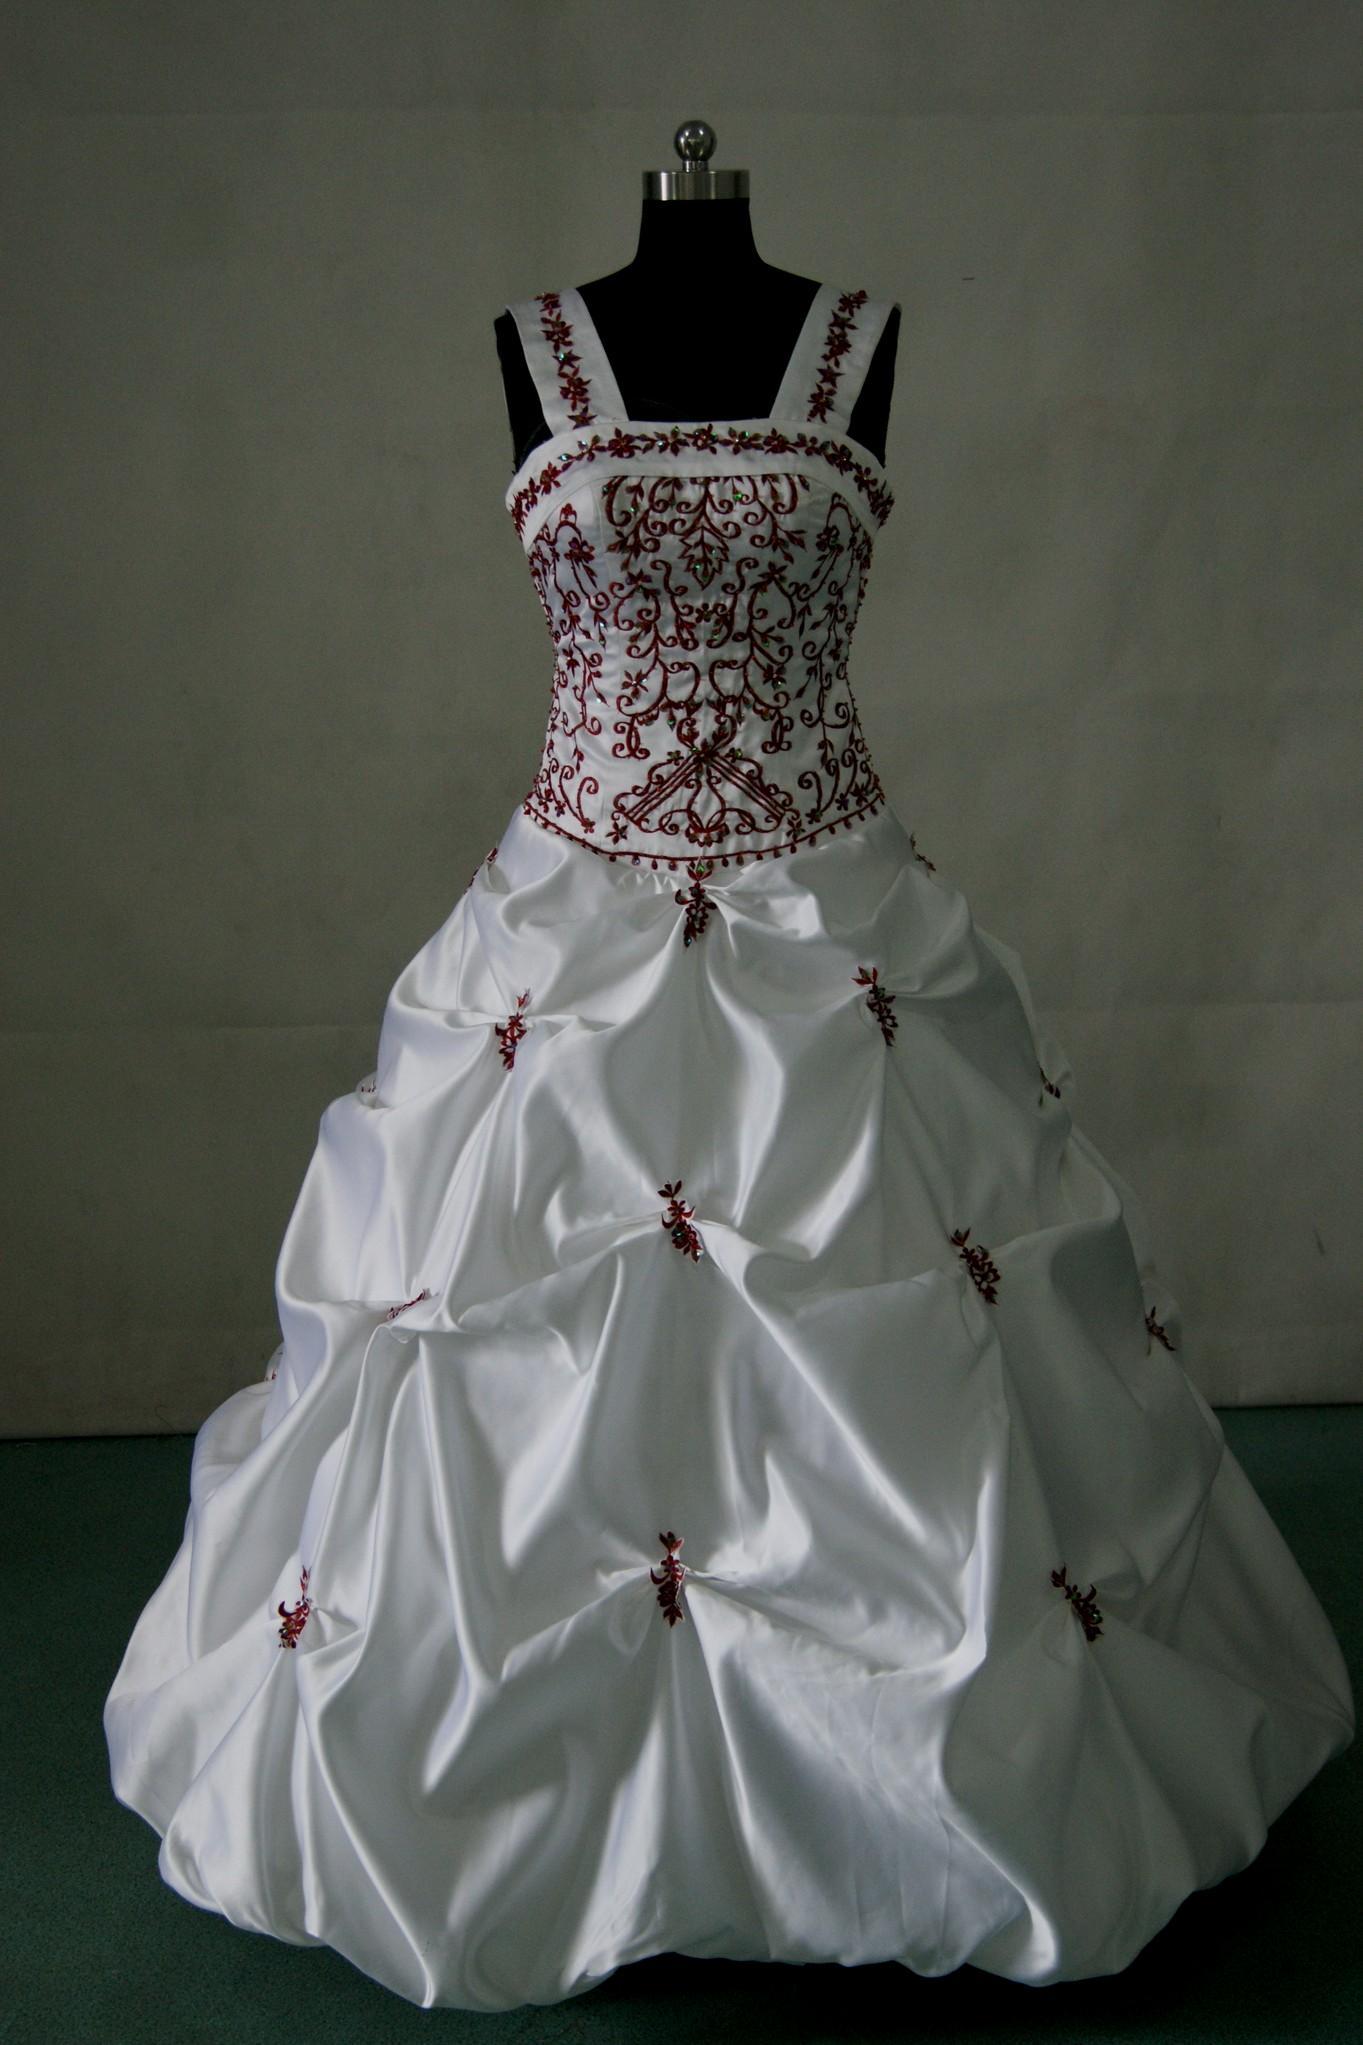 celtic wedding dresses for sale photo - 1